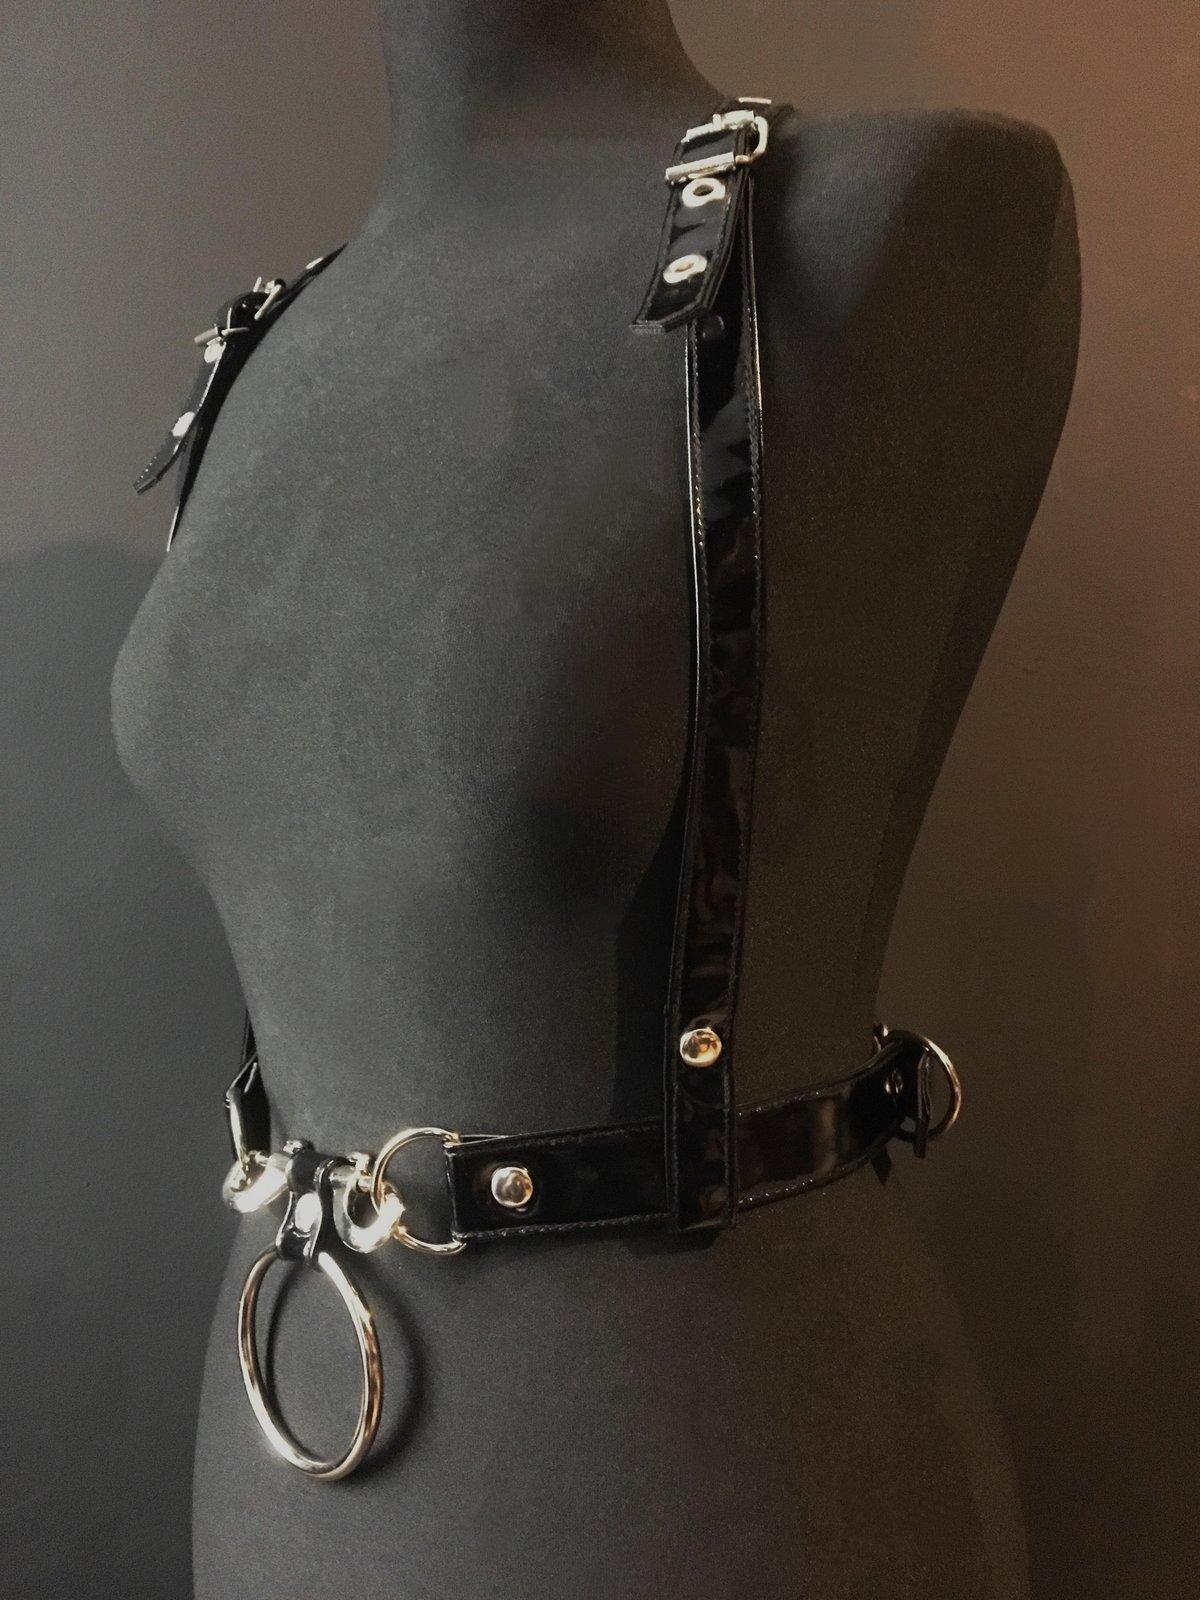 Gotte harness PVC